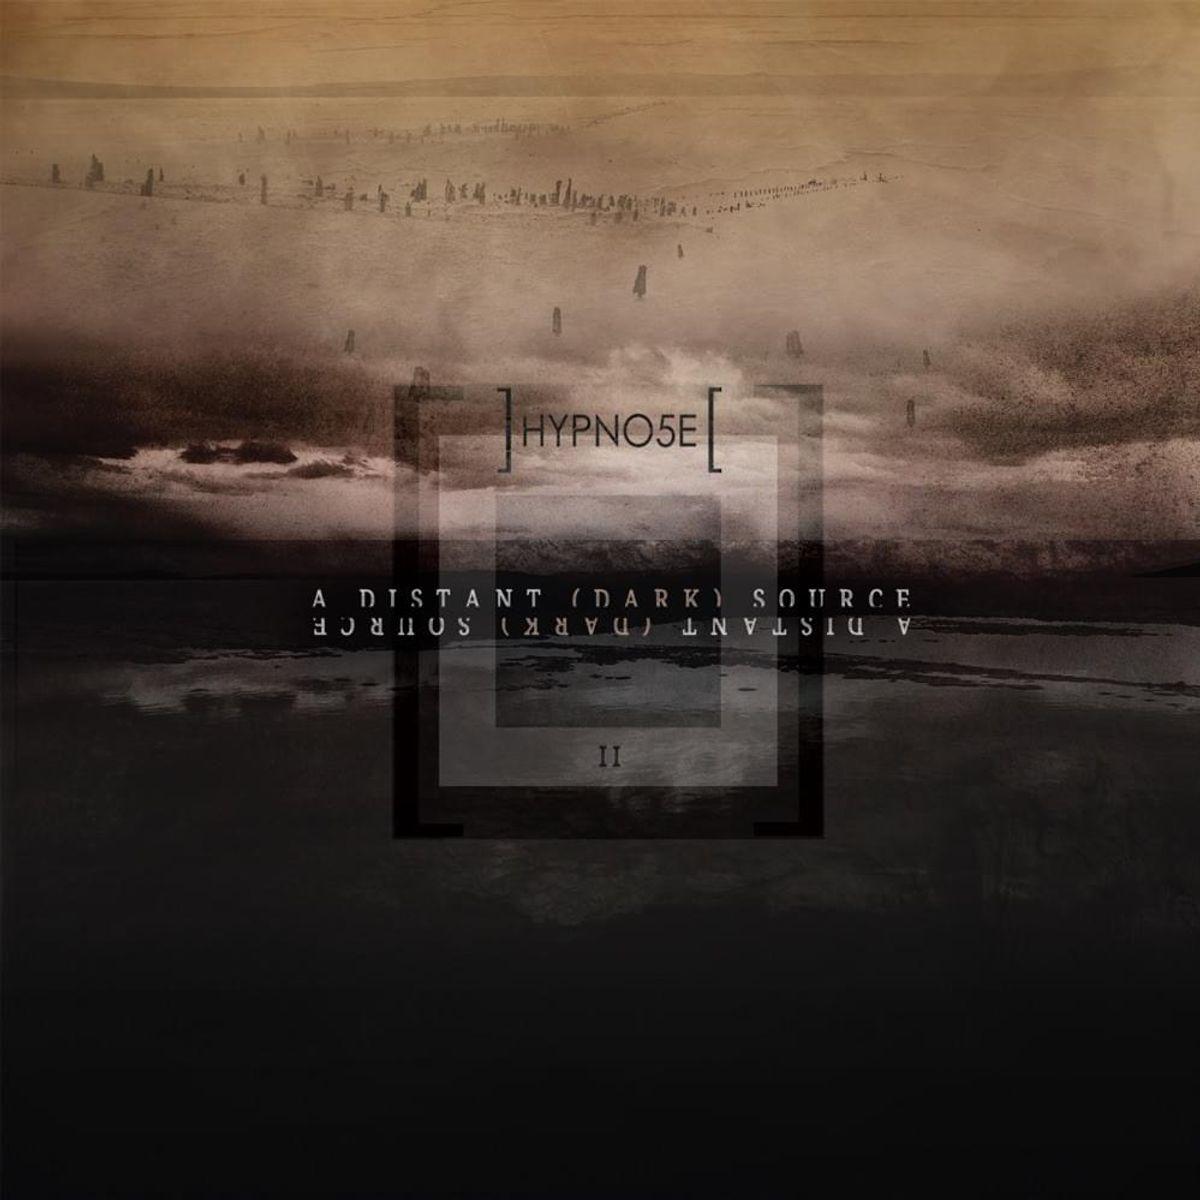 Hypno5e - On The Dry Lake